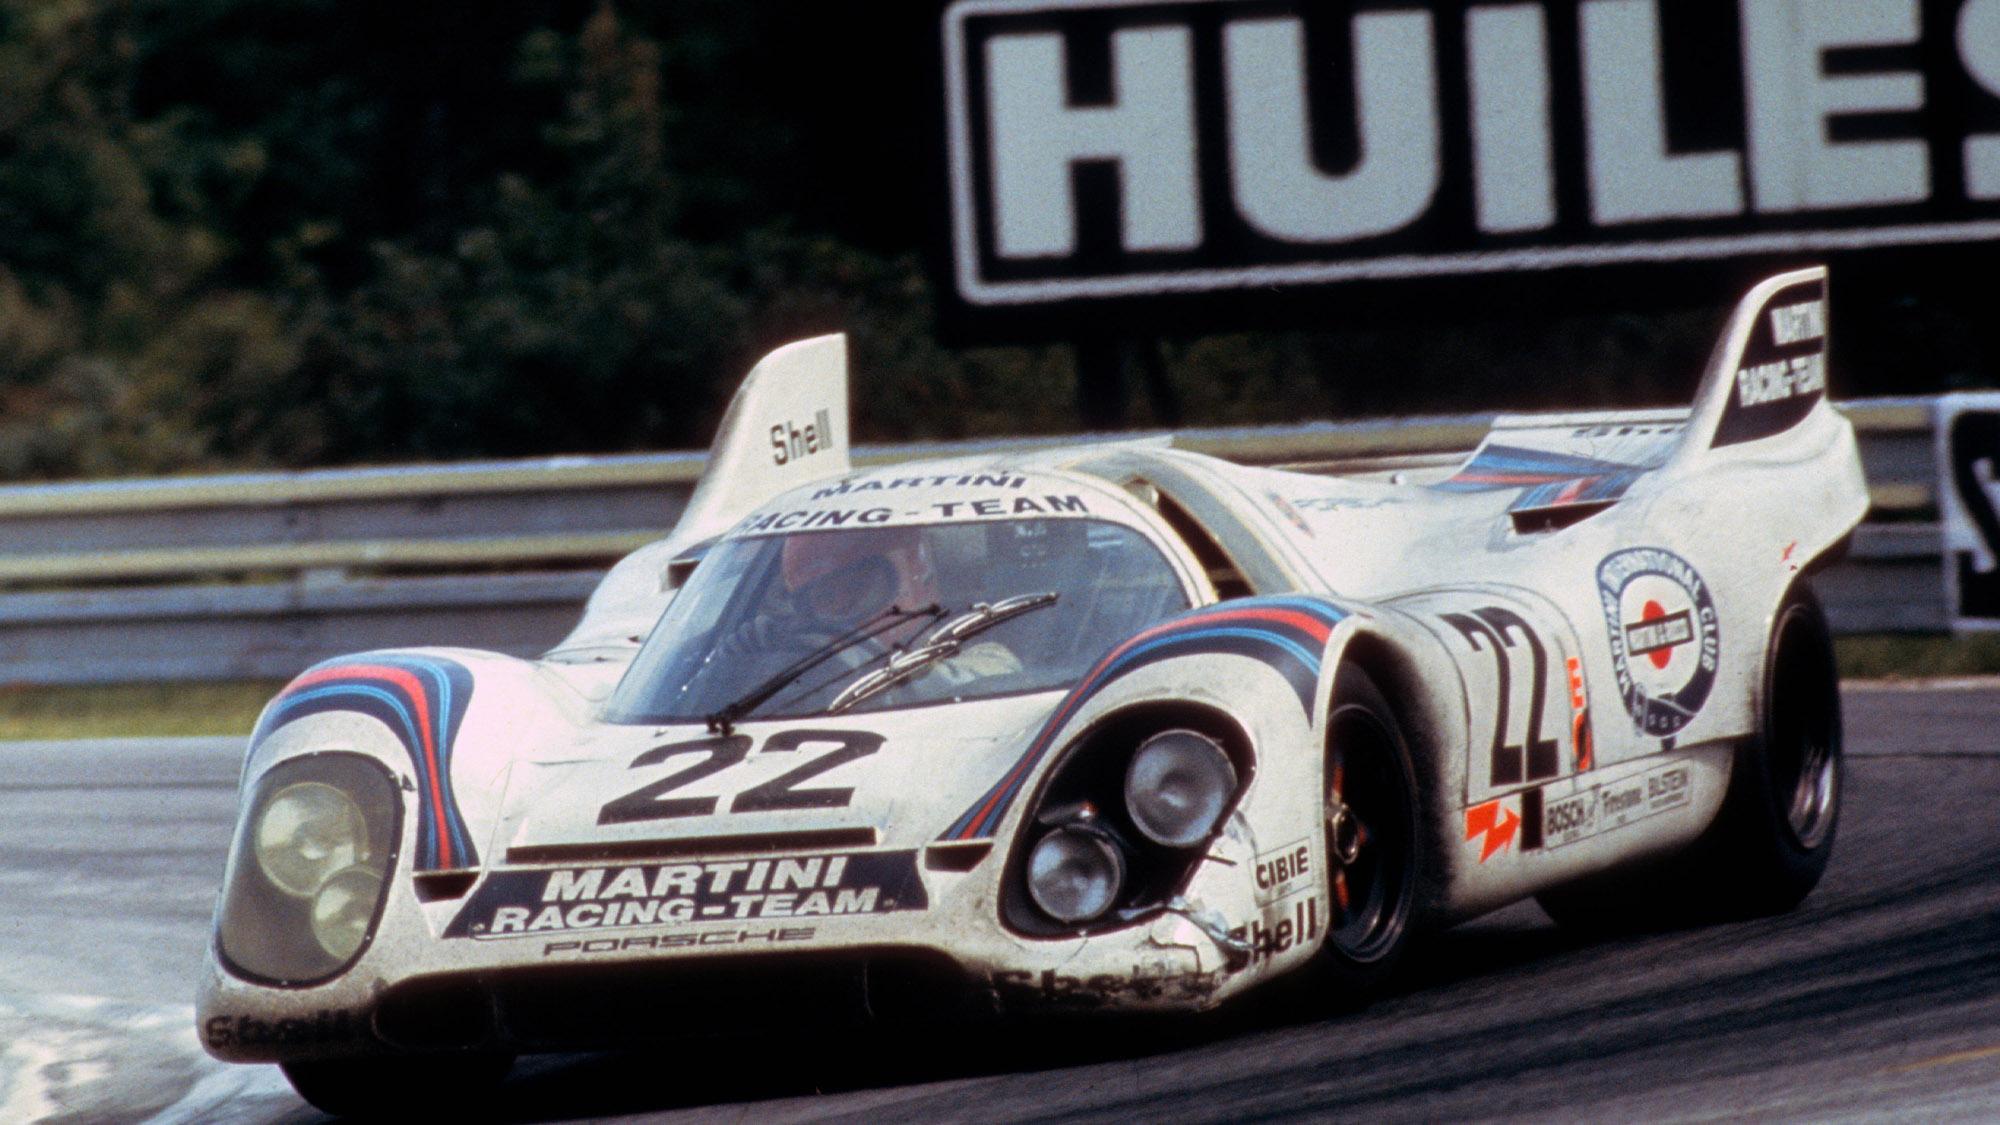 1971 Le Mans winning Martini Porsche 917